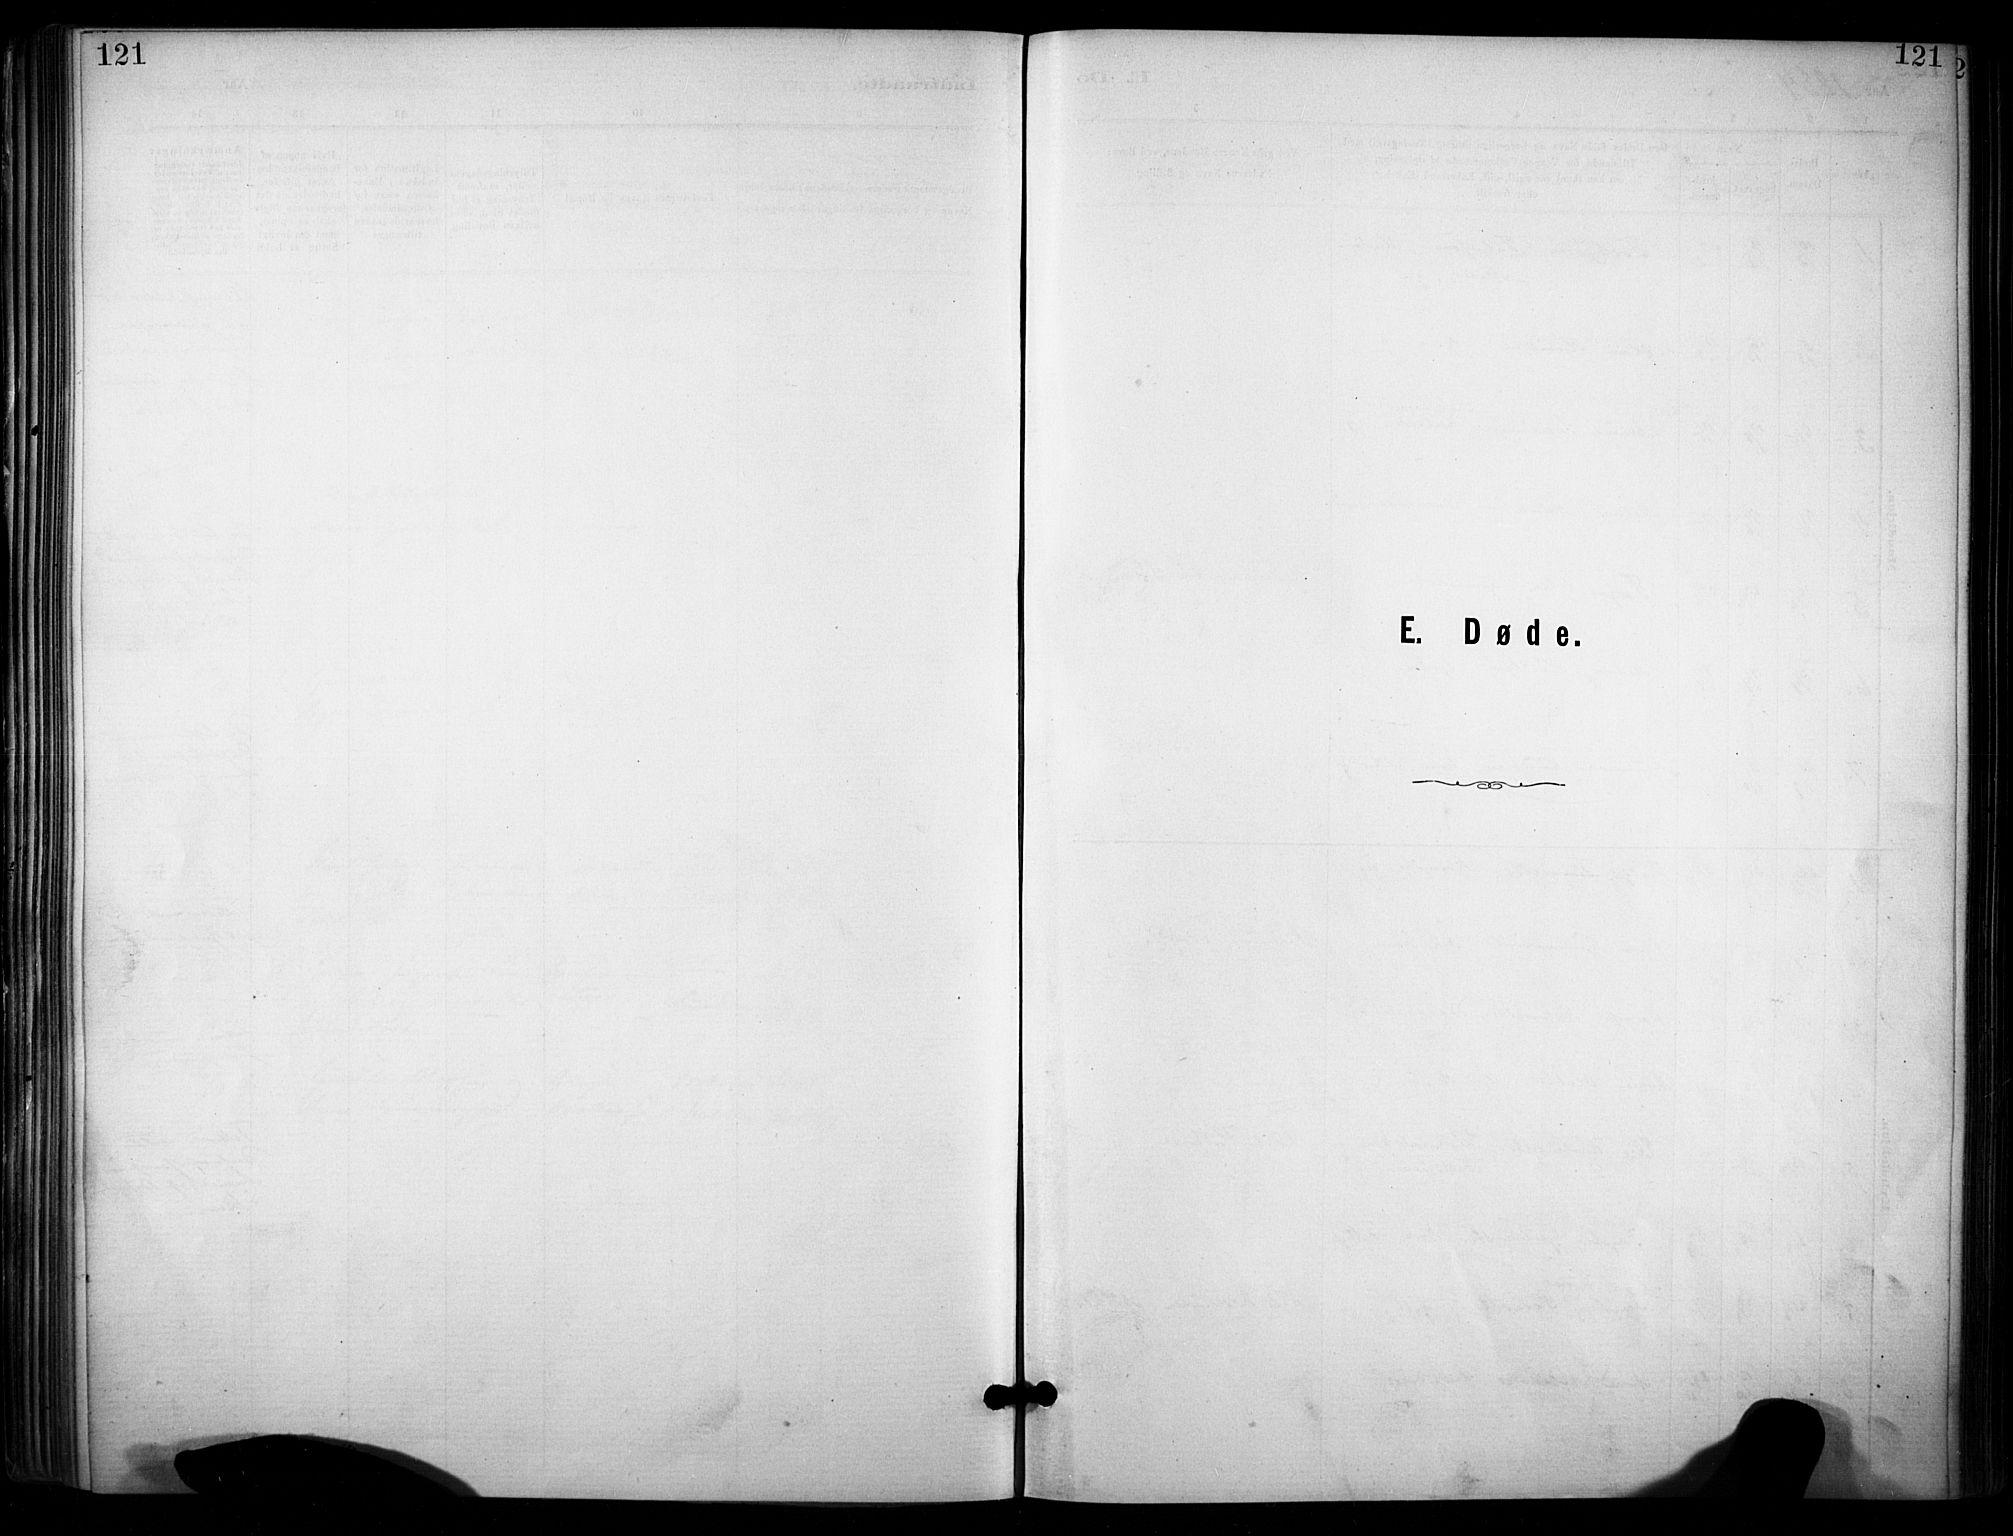 SAKO, Lunde kirkebøker, F/Fa/L0002: Ministerialbok nr. I 2, 1884-1892, s. 121